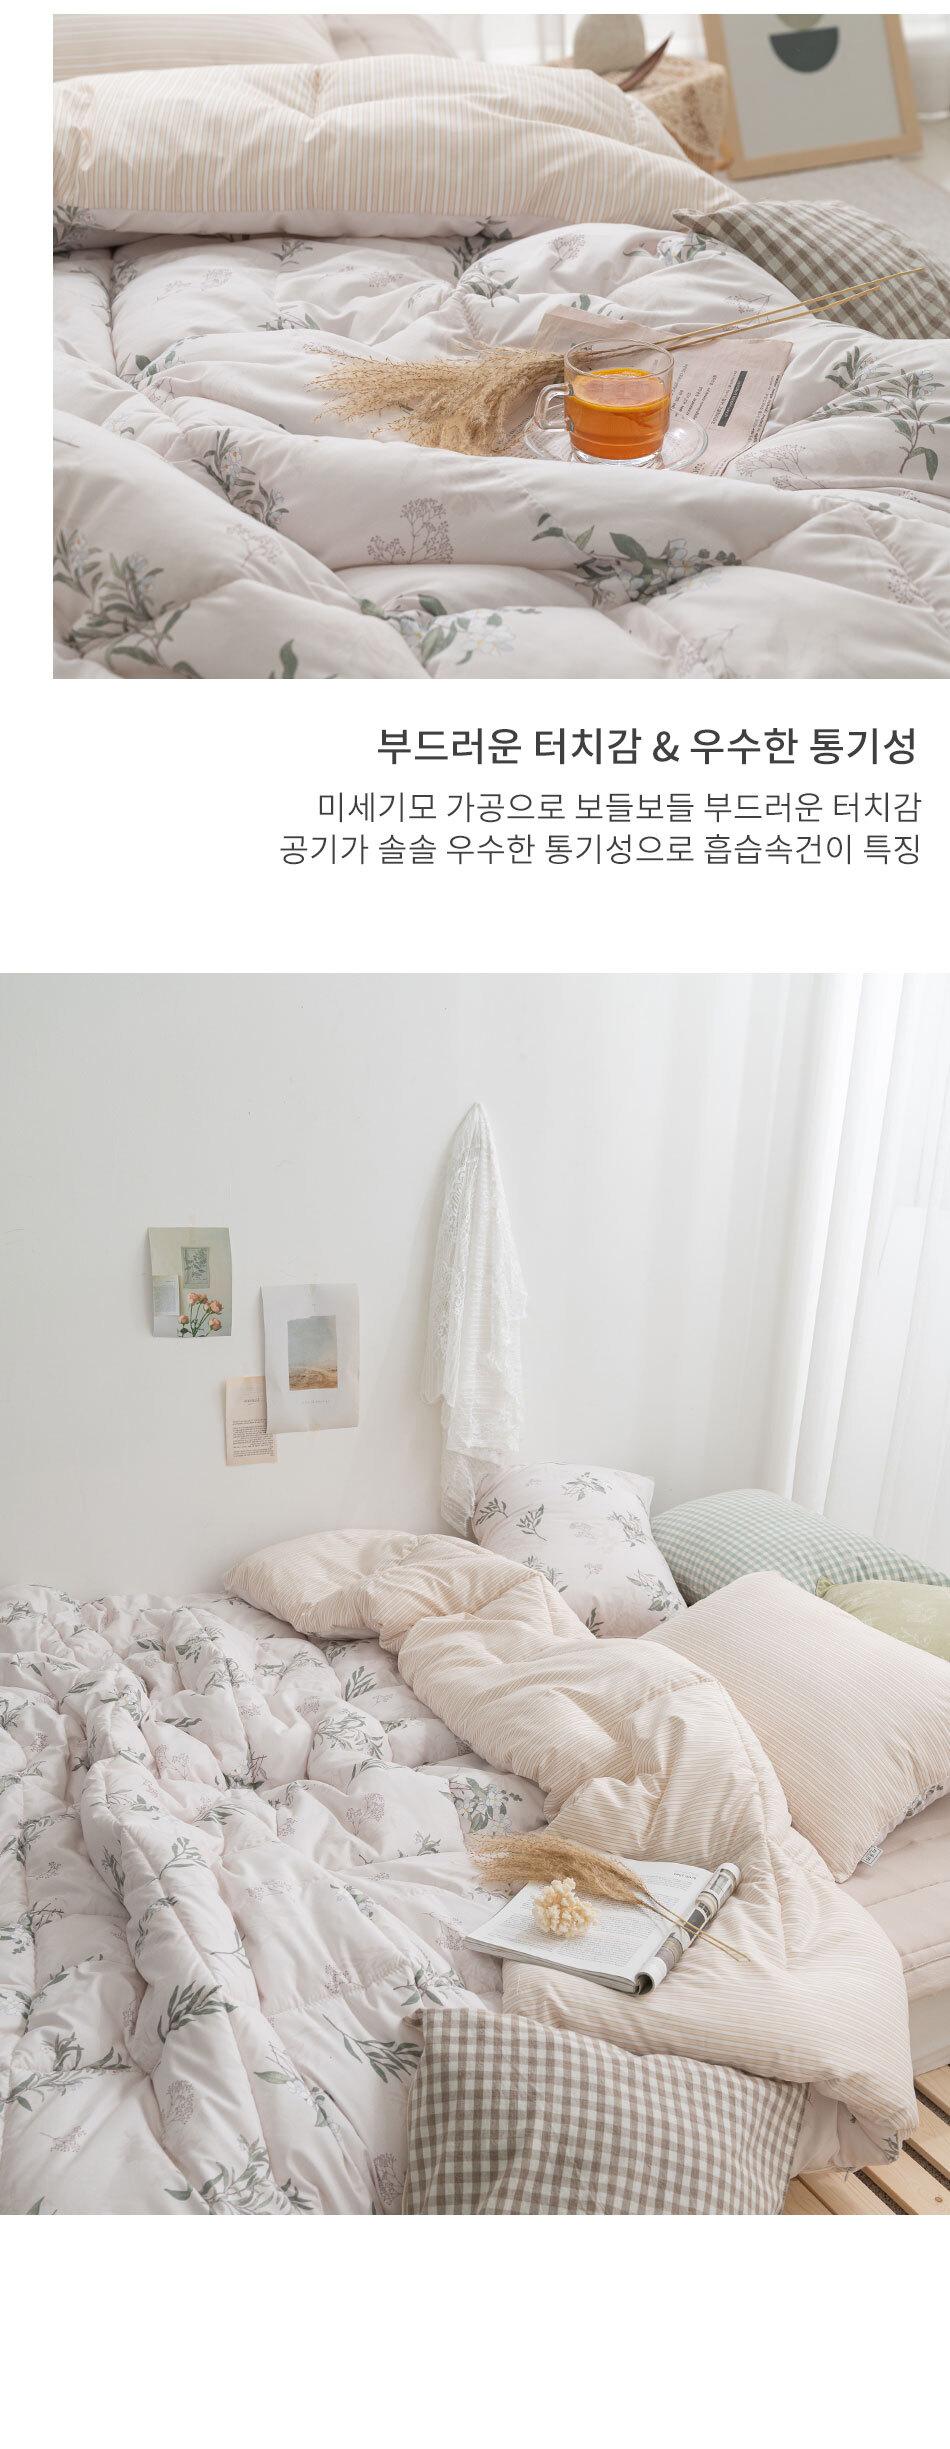 bailey_bed_02.jpg